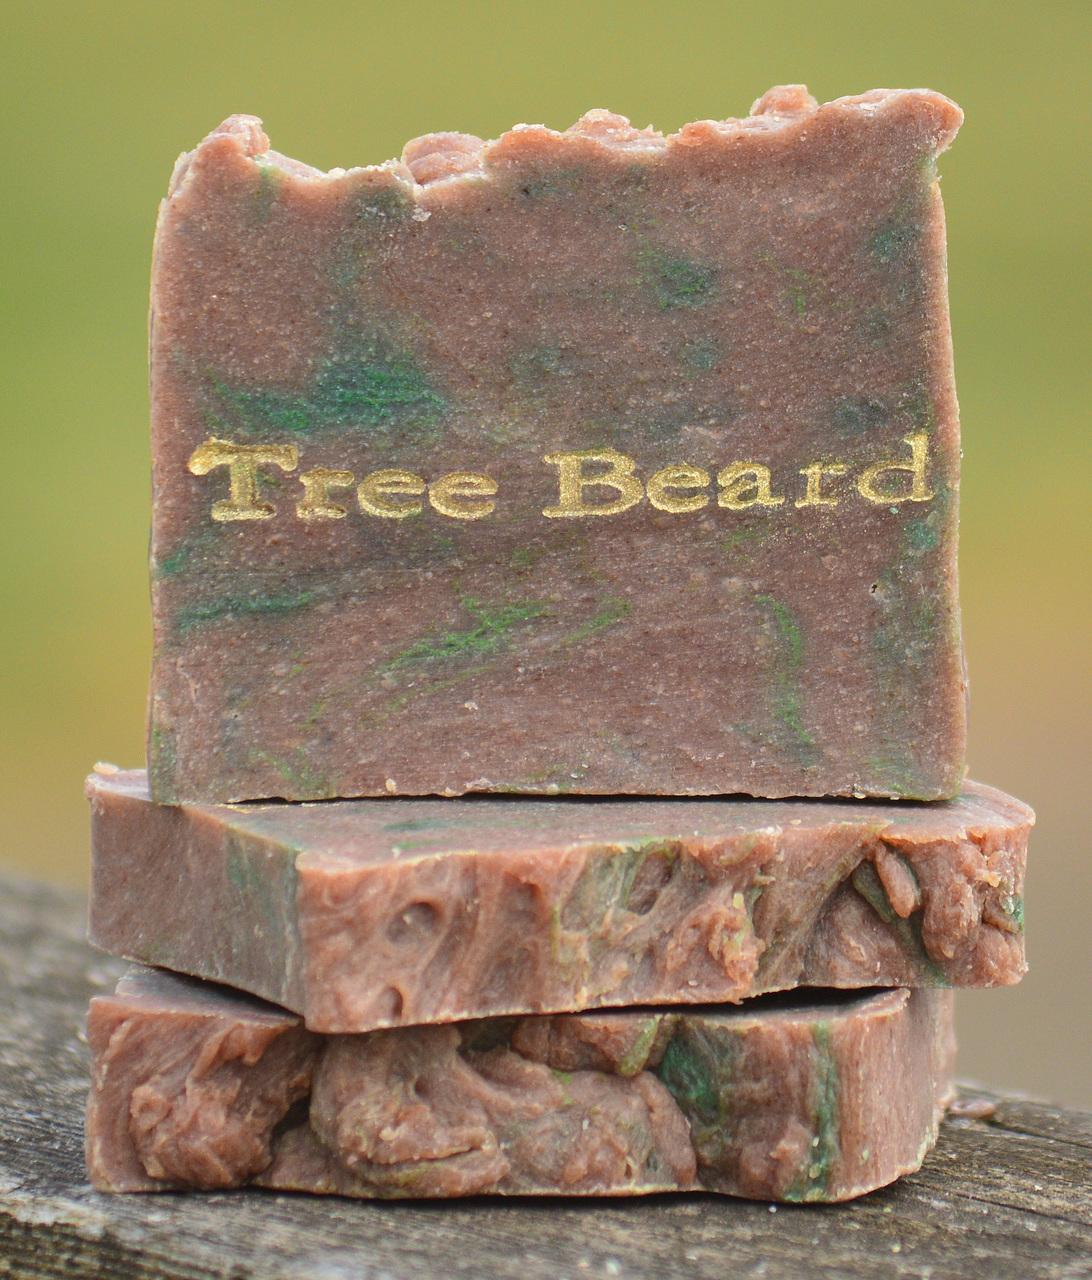 Tree Beard Goat Milk Soap Slice